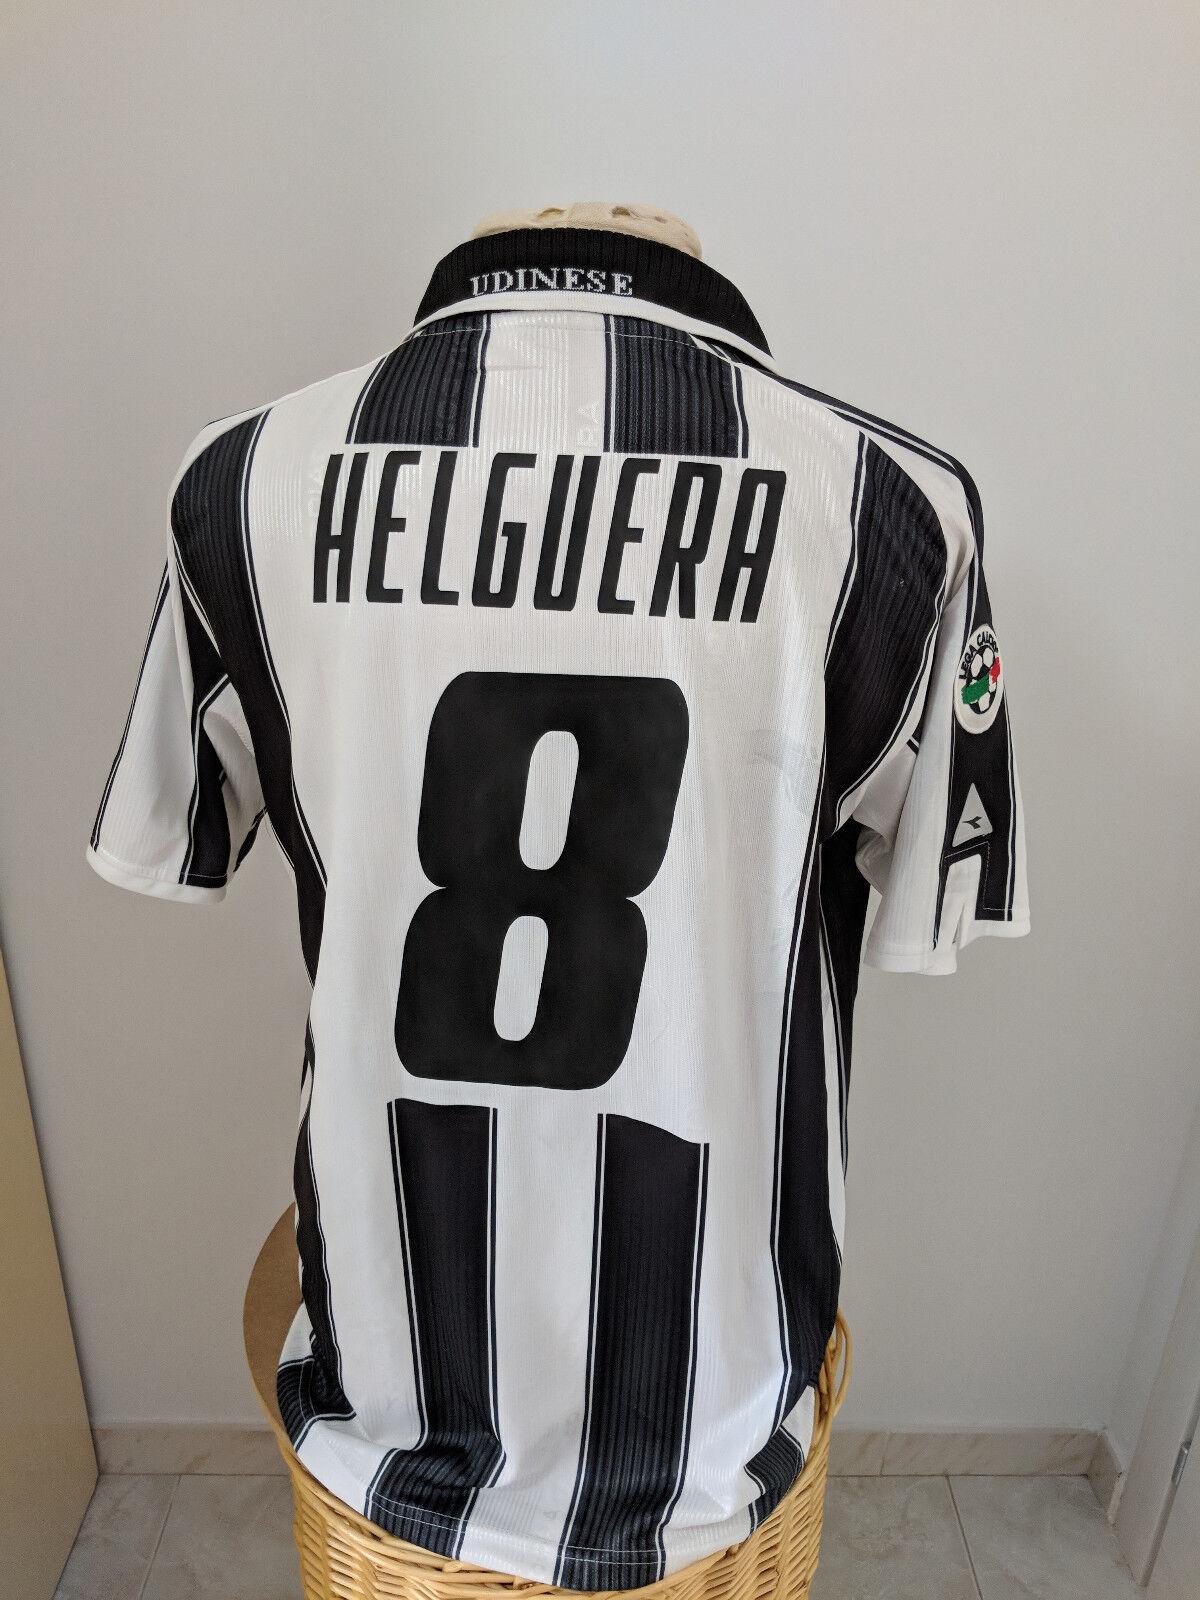 Maglia Udinese 2001 02 Nr 8 Helguera match worn shirt jersey camiseta Espana